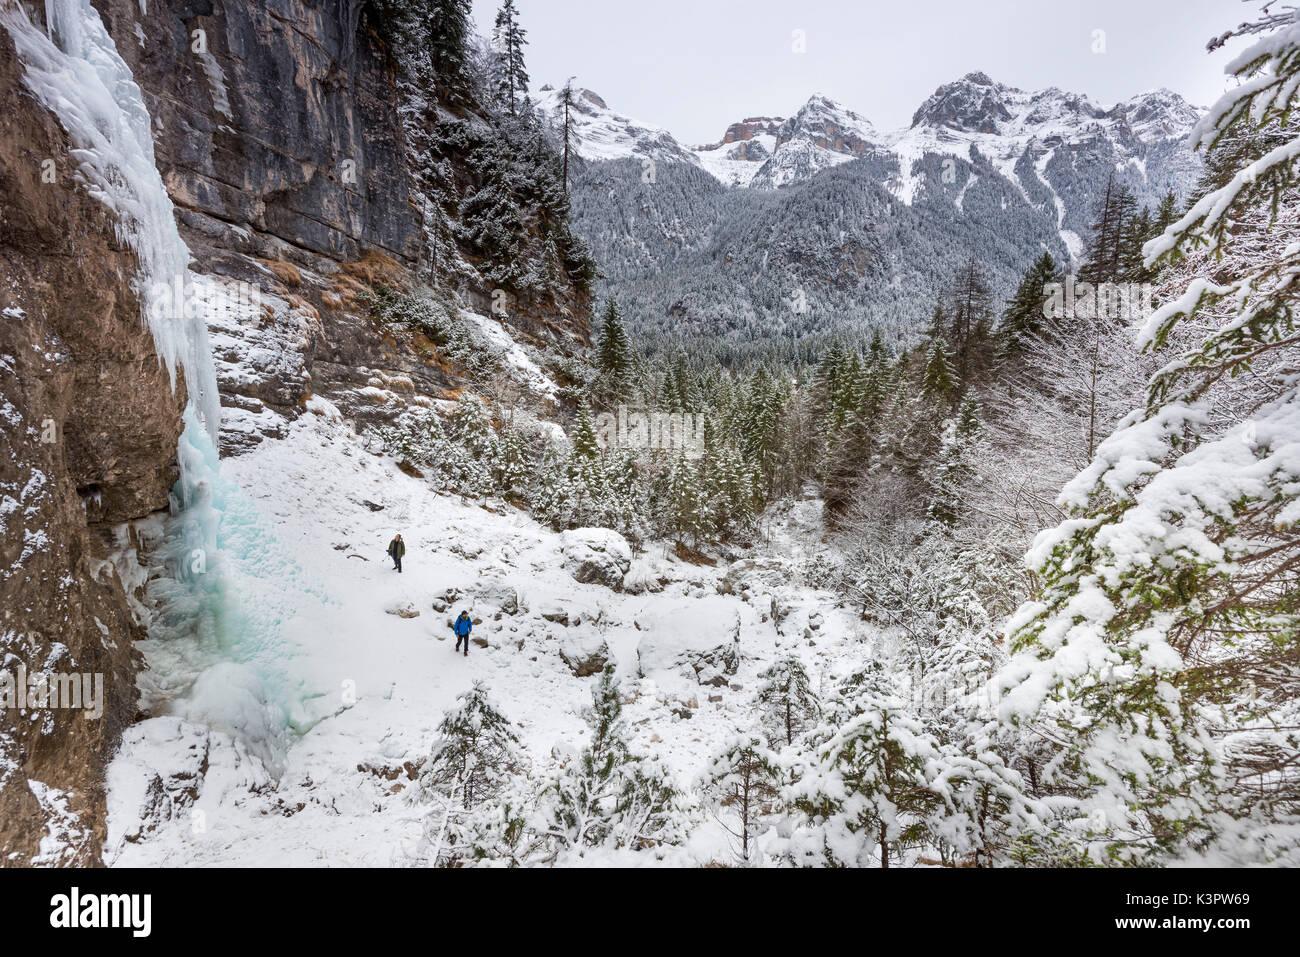 Eisfall Rislà und Naturpark Adamello Brenta Europa, Italien, Trentino Alto Adige, Trento, Nonstal, Tovel Tal, Tuenno Stadt Stockbild